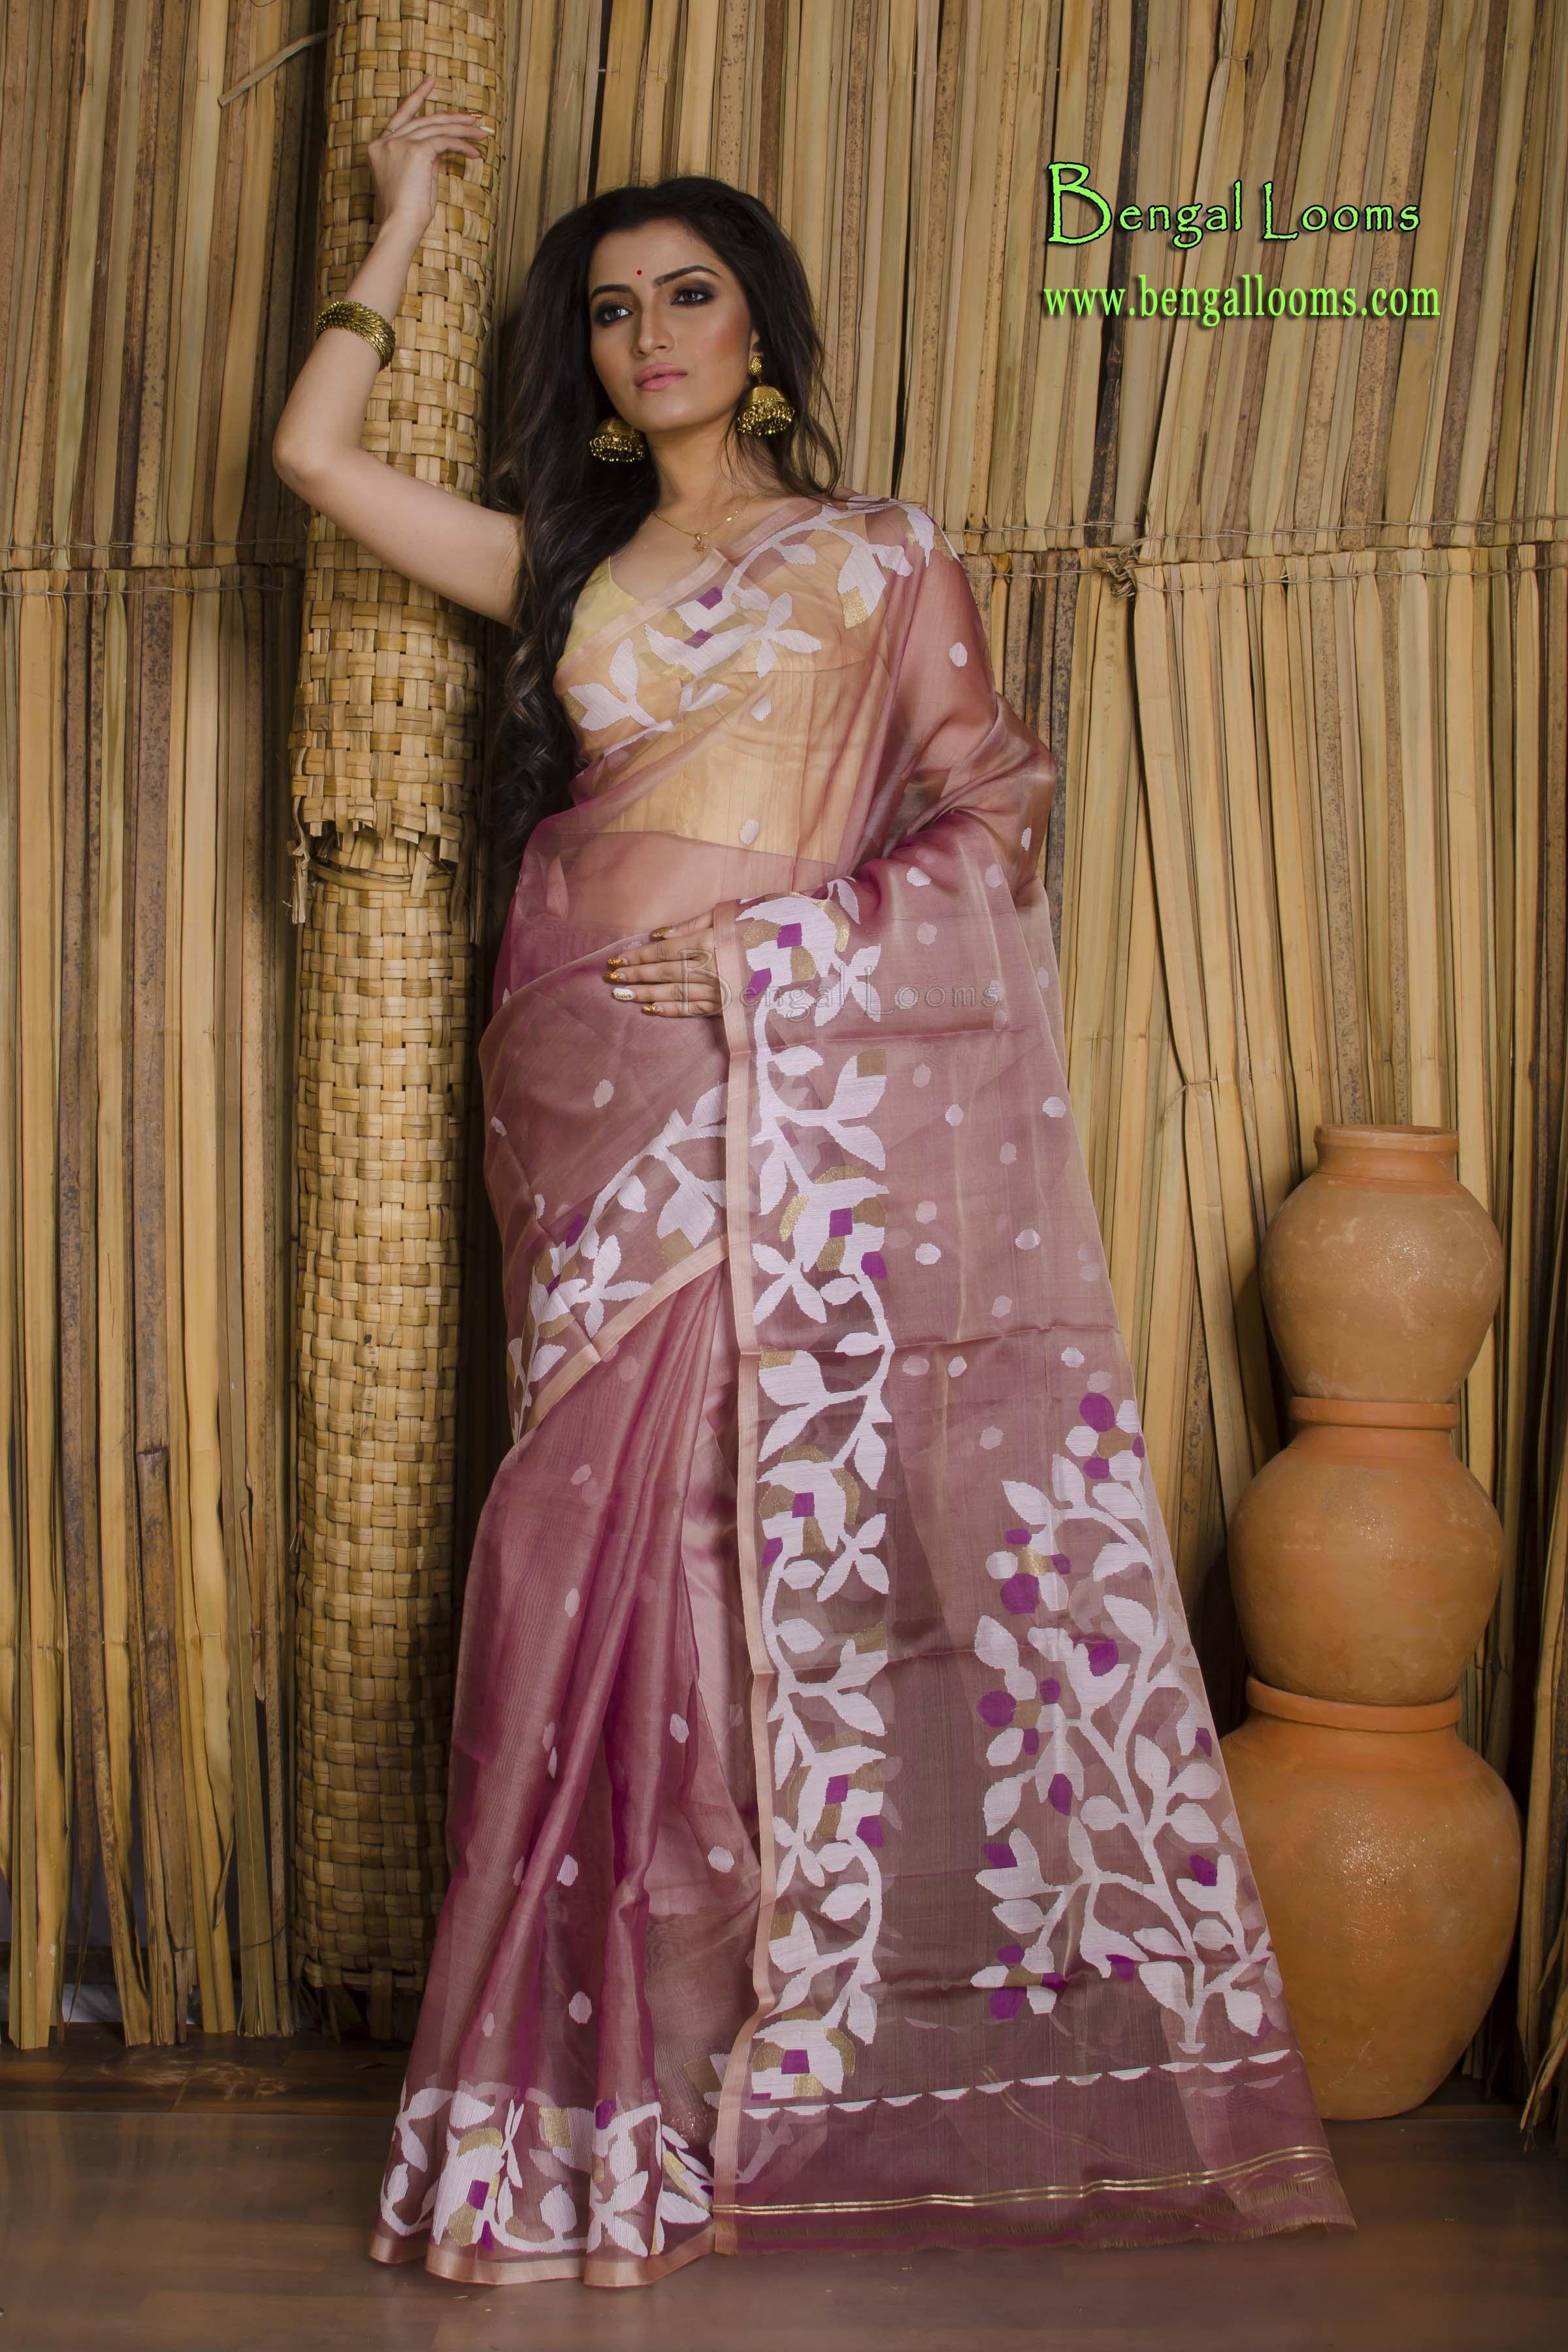 a6cf21b6b63a03 Muslin Jamdani Saree in Onion Pink and White